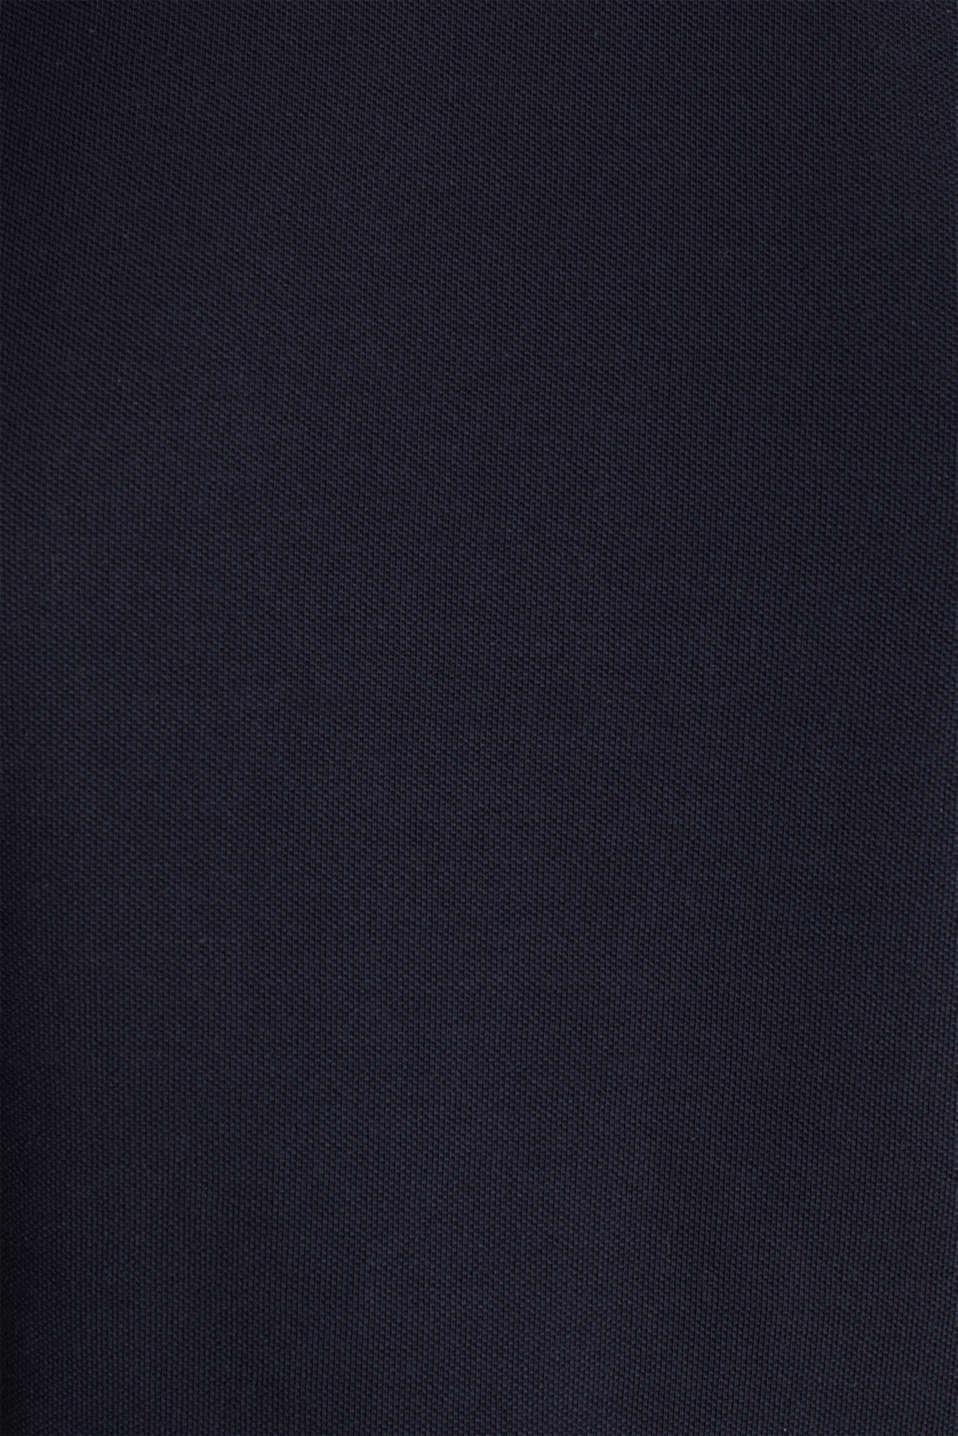 Piqué top, 100% cotton, NAVY, detail image number 3